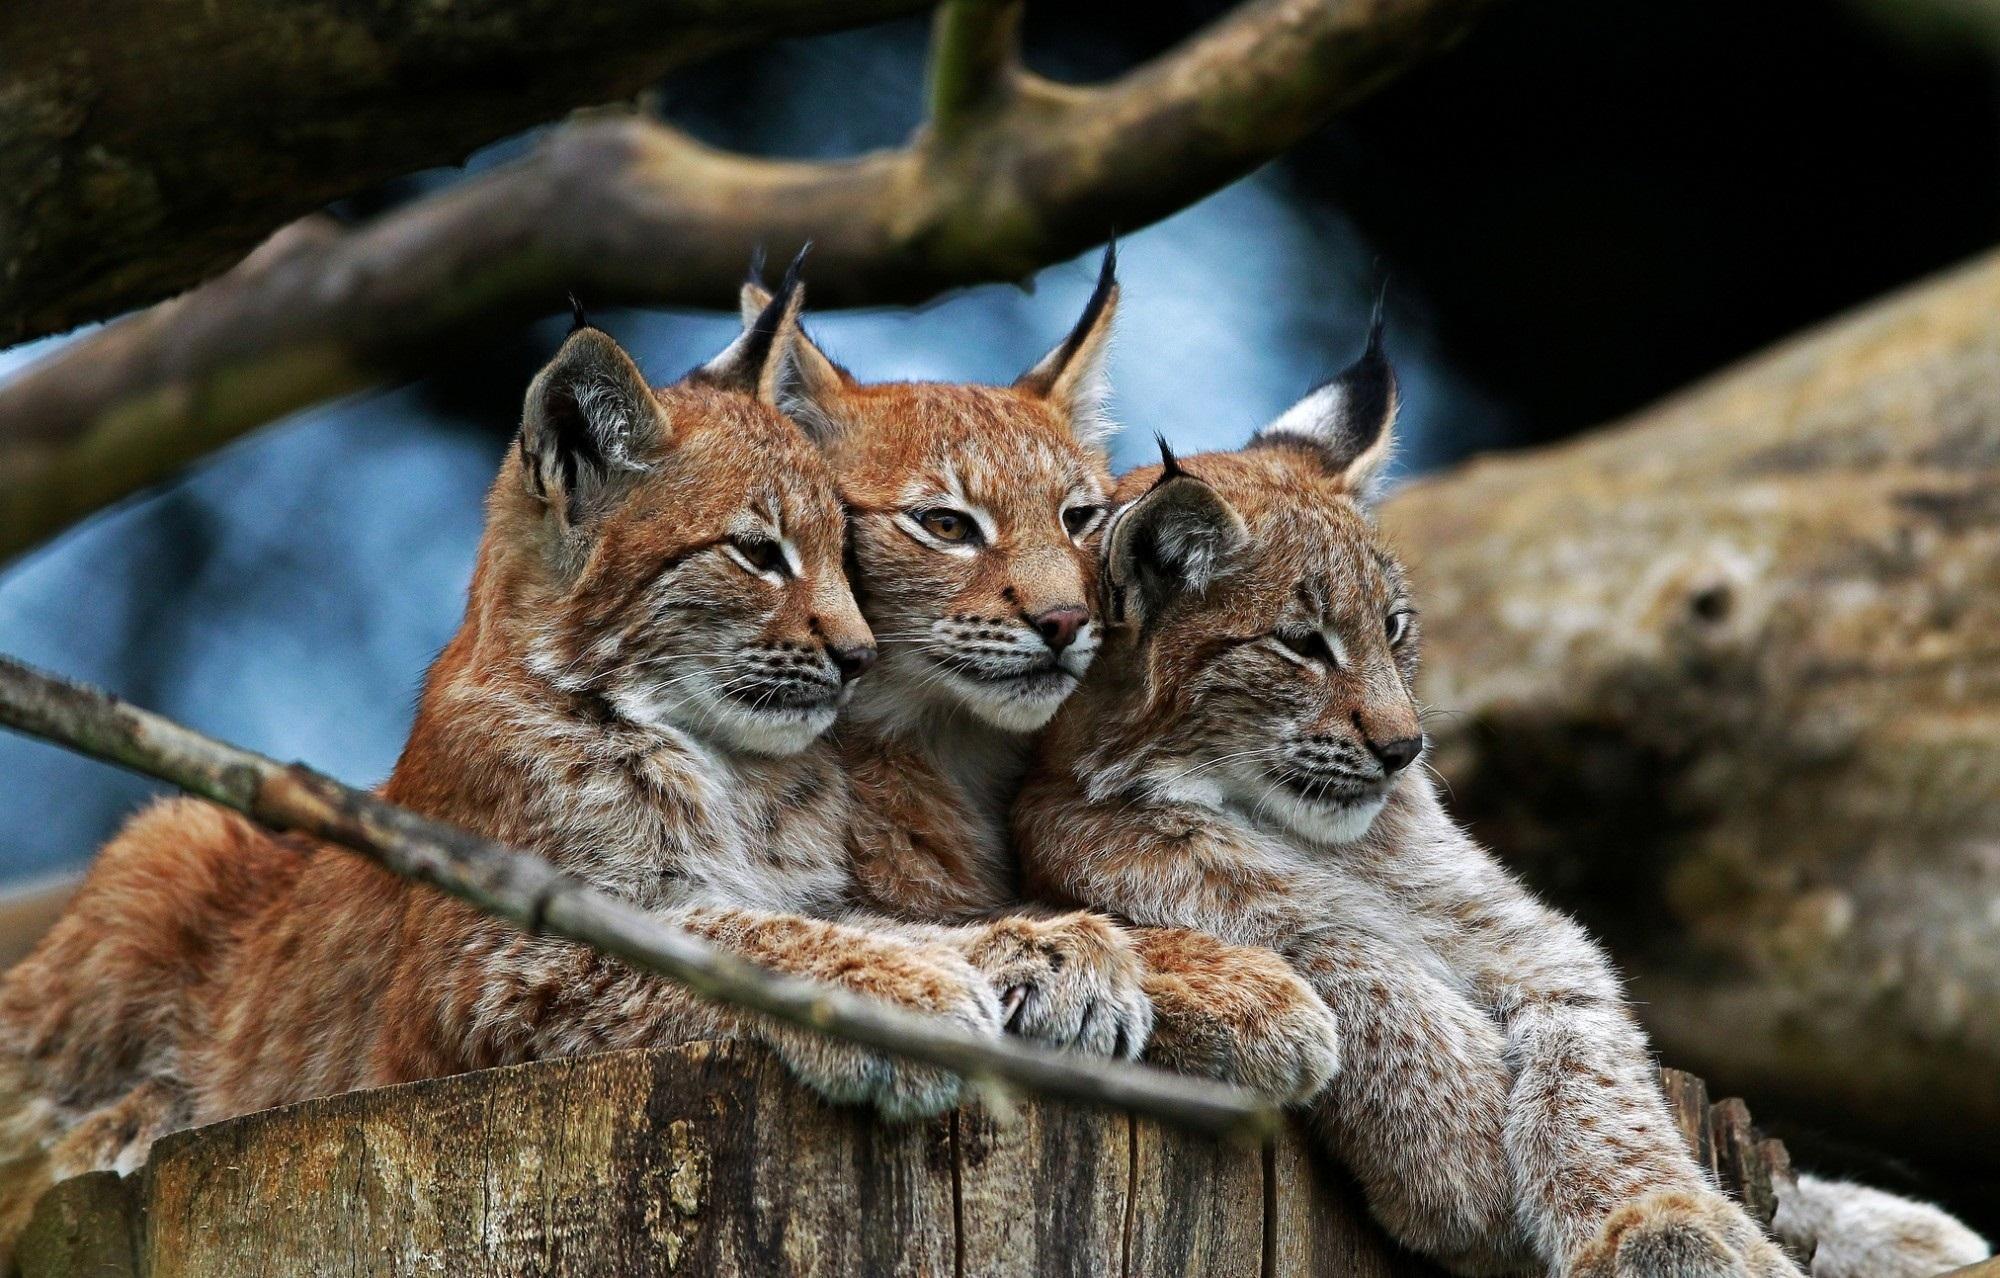 Bobcat North American mammal of cat family Felidae, Lynx ... |Lynx Cat Family